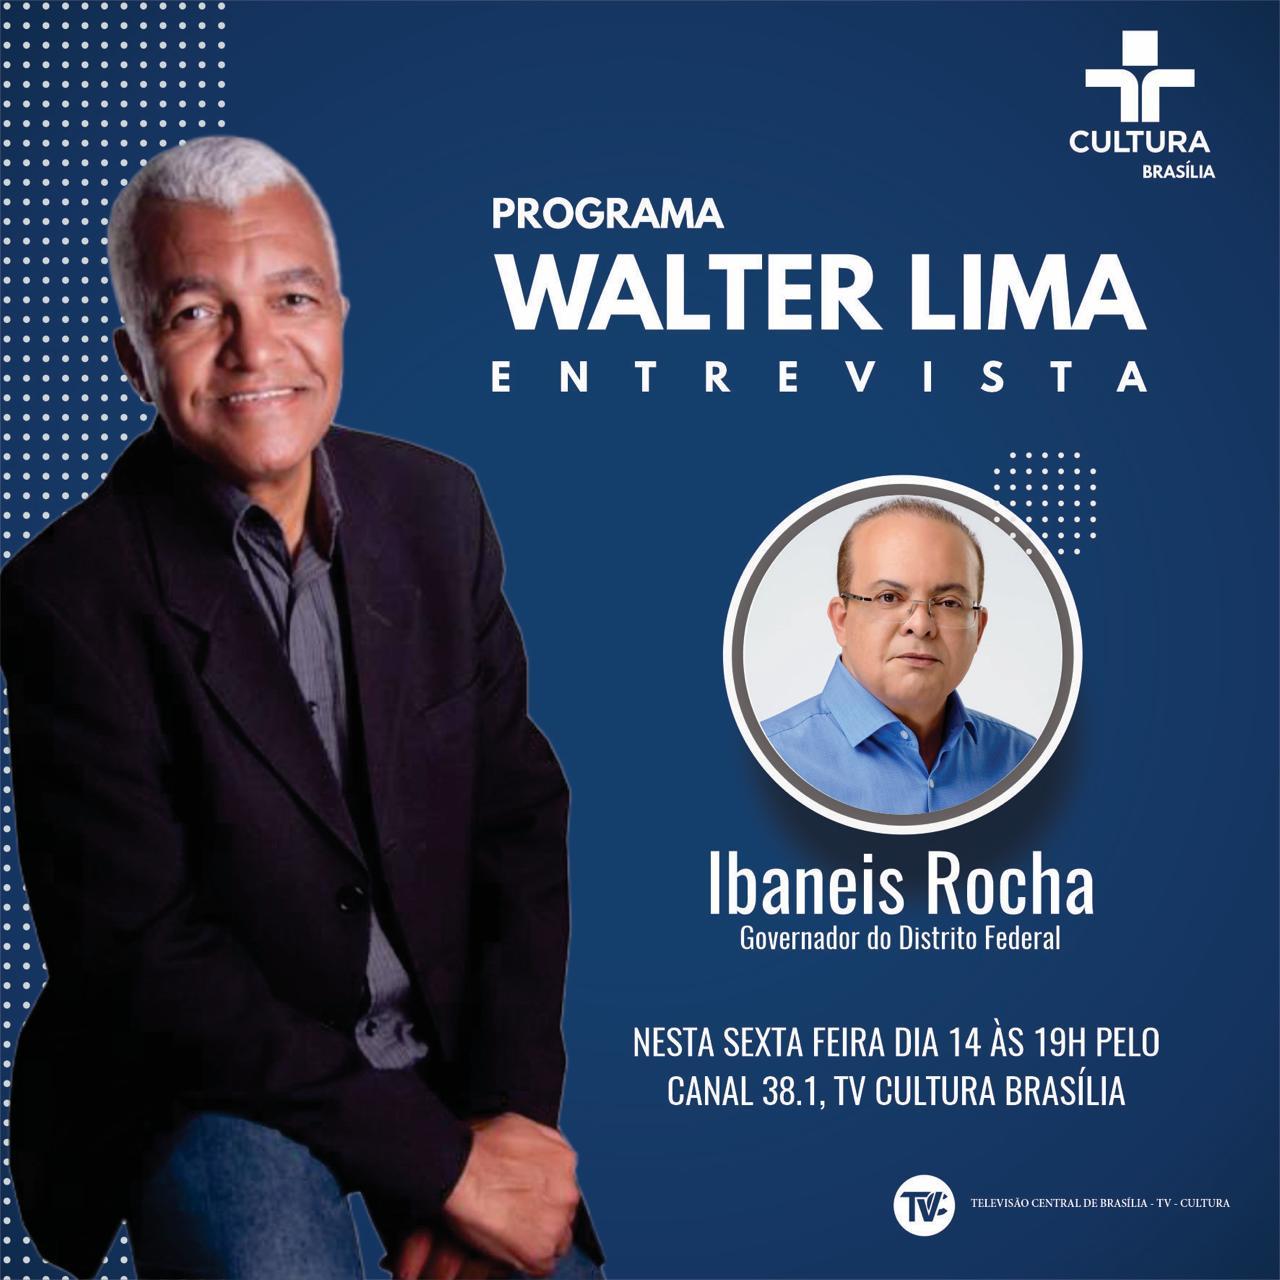 No ar: Walter Lima – Entrevista pela TV Cultura Brasília